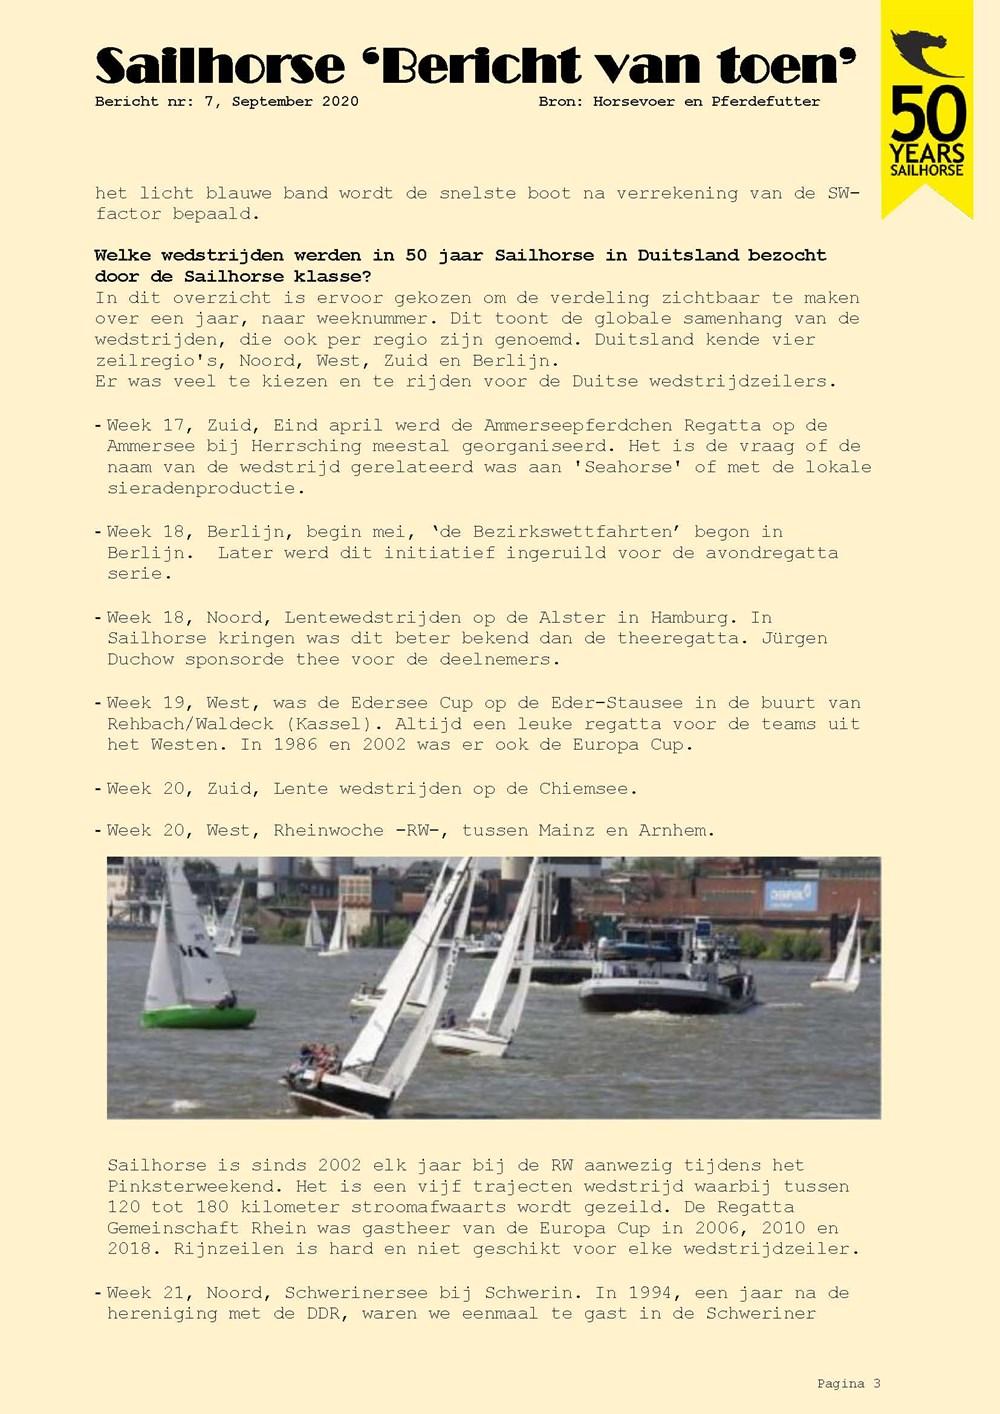 BvT7_Page_3.jpg